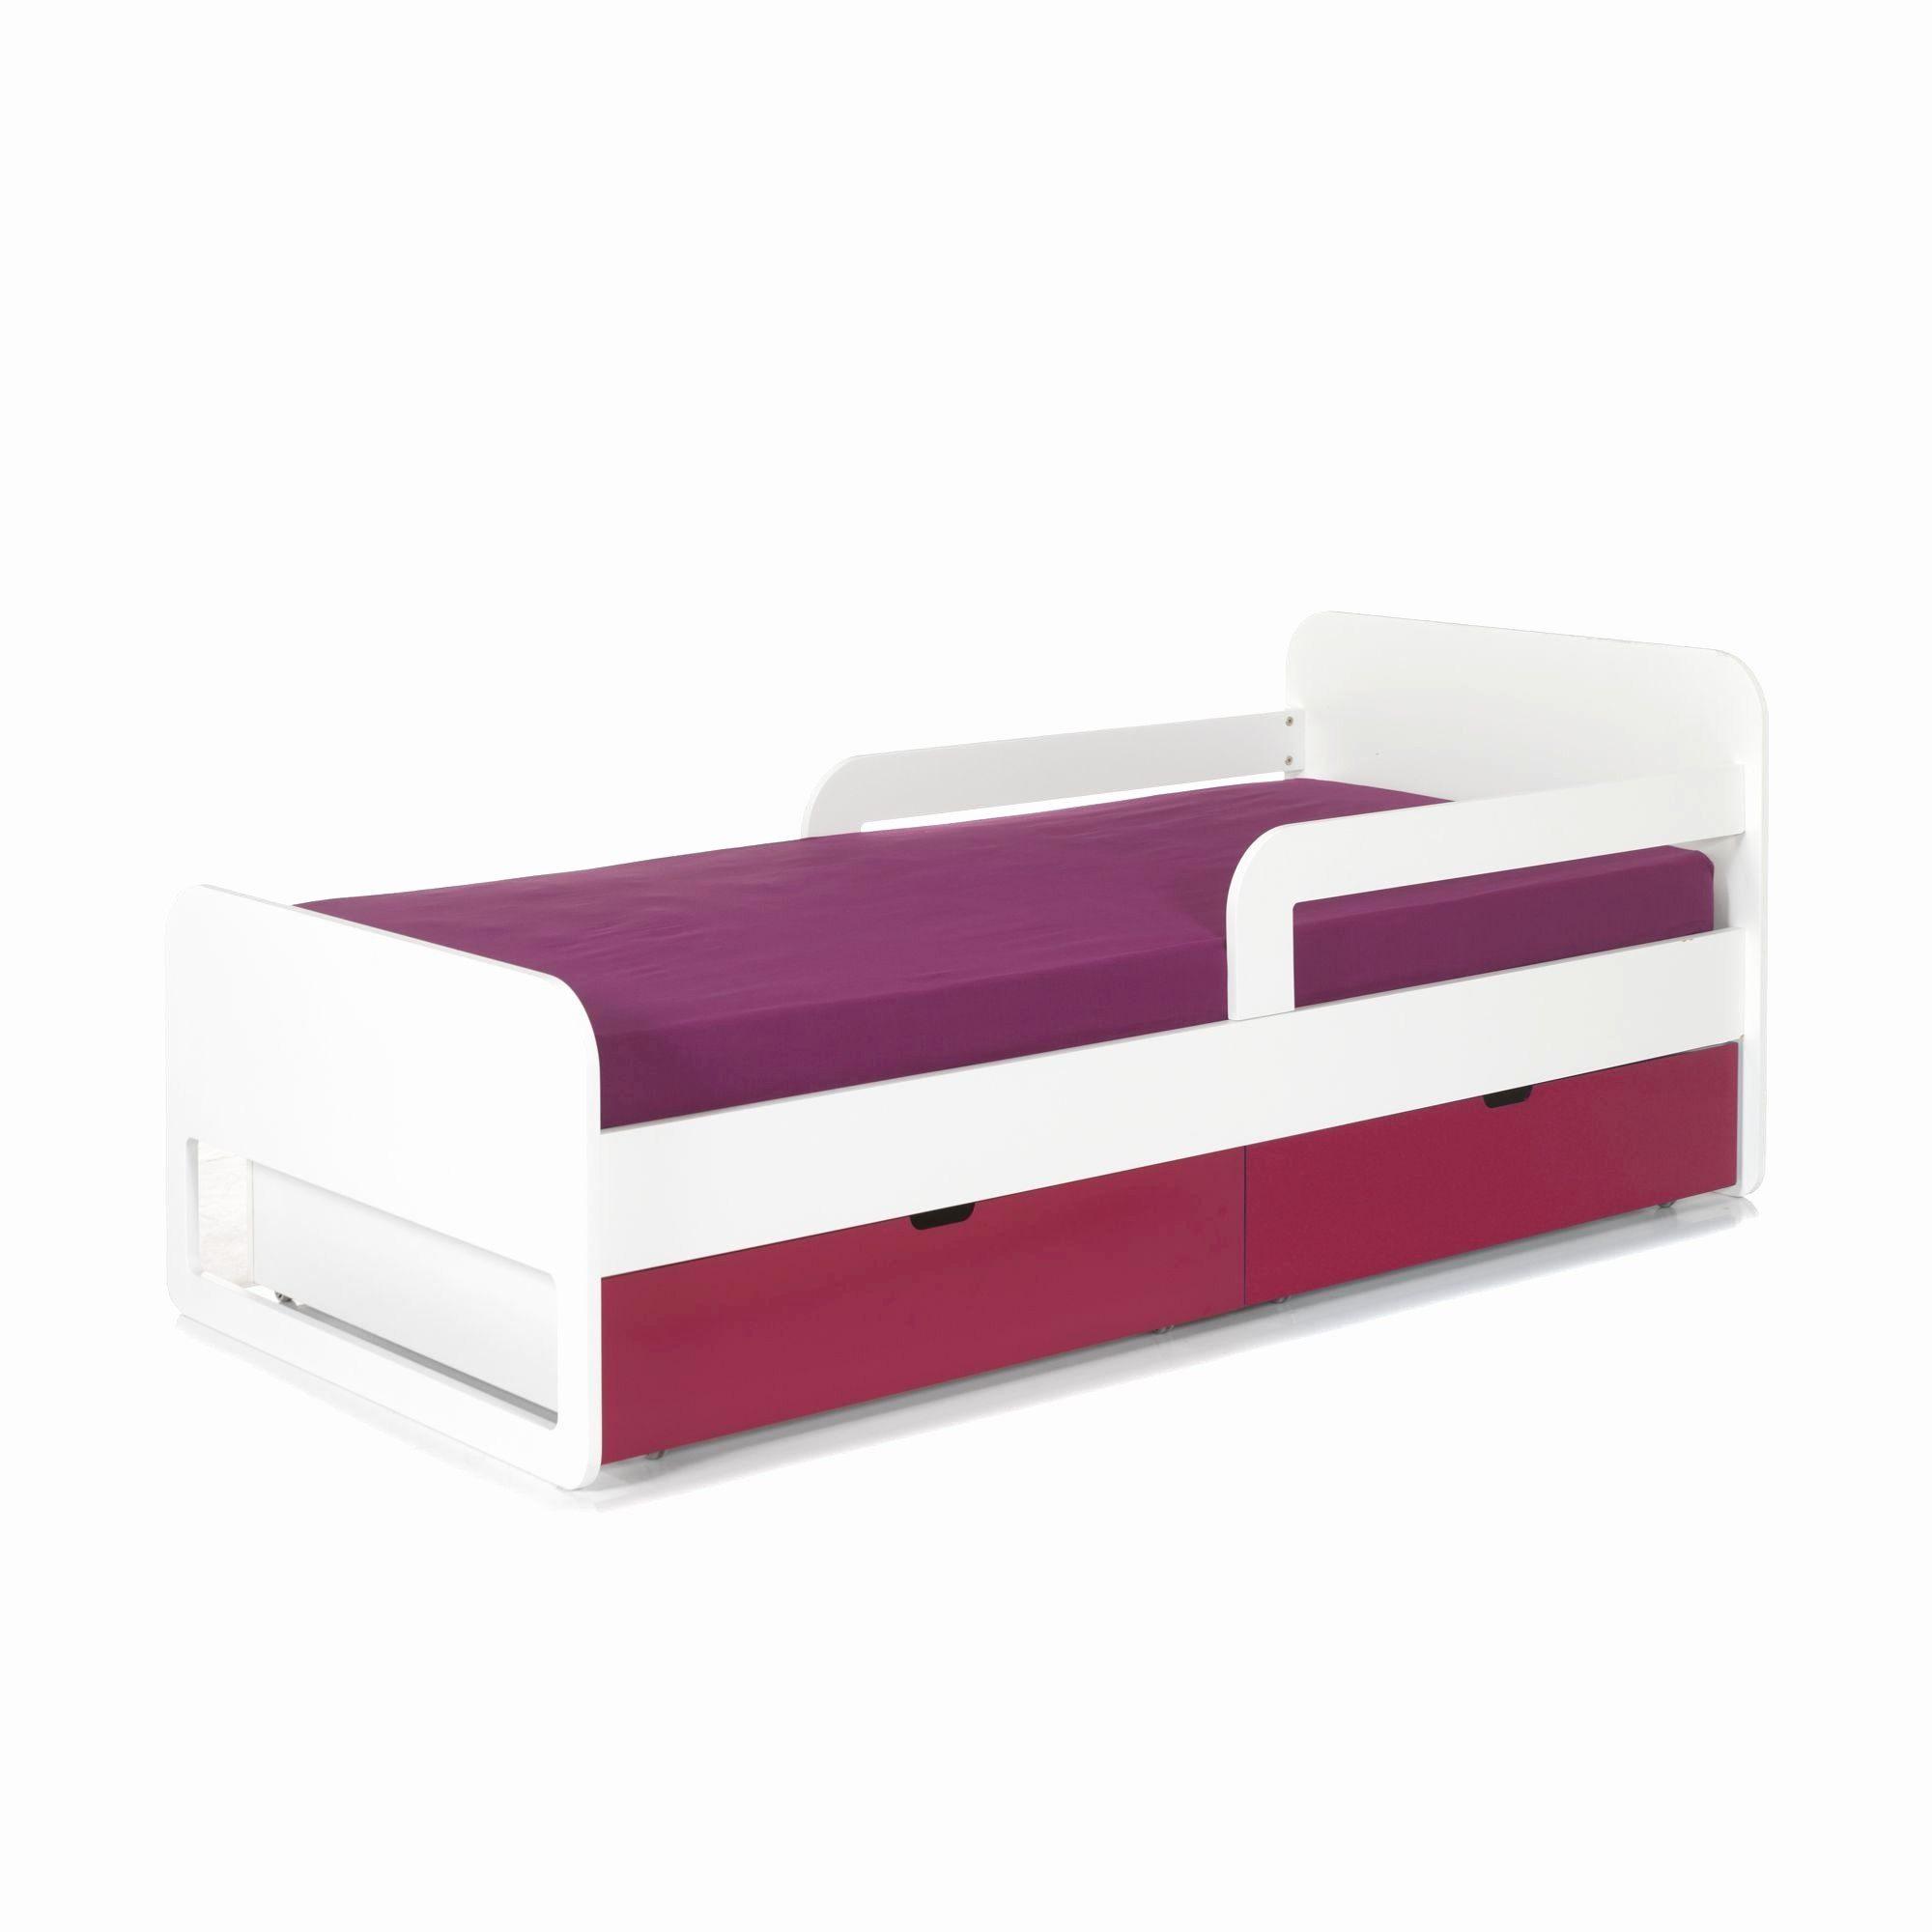 Lit Avec Tiroir Ikea Impressionnant Ikea Lit Gigogne Adulte Inspirational 49 Luxe S De Lit Tiroir 2